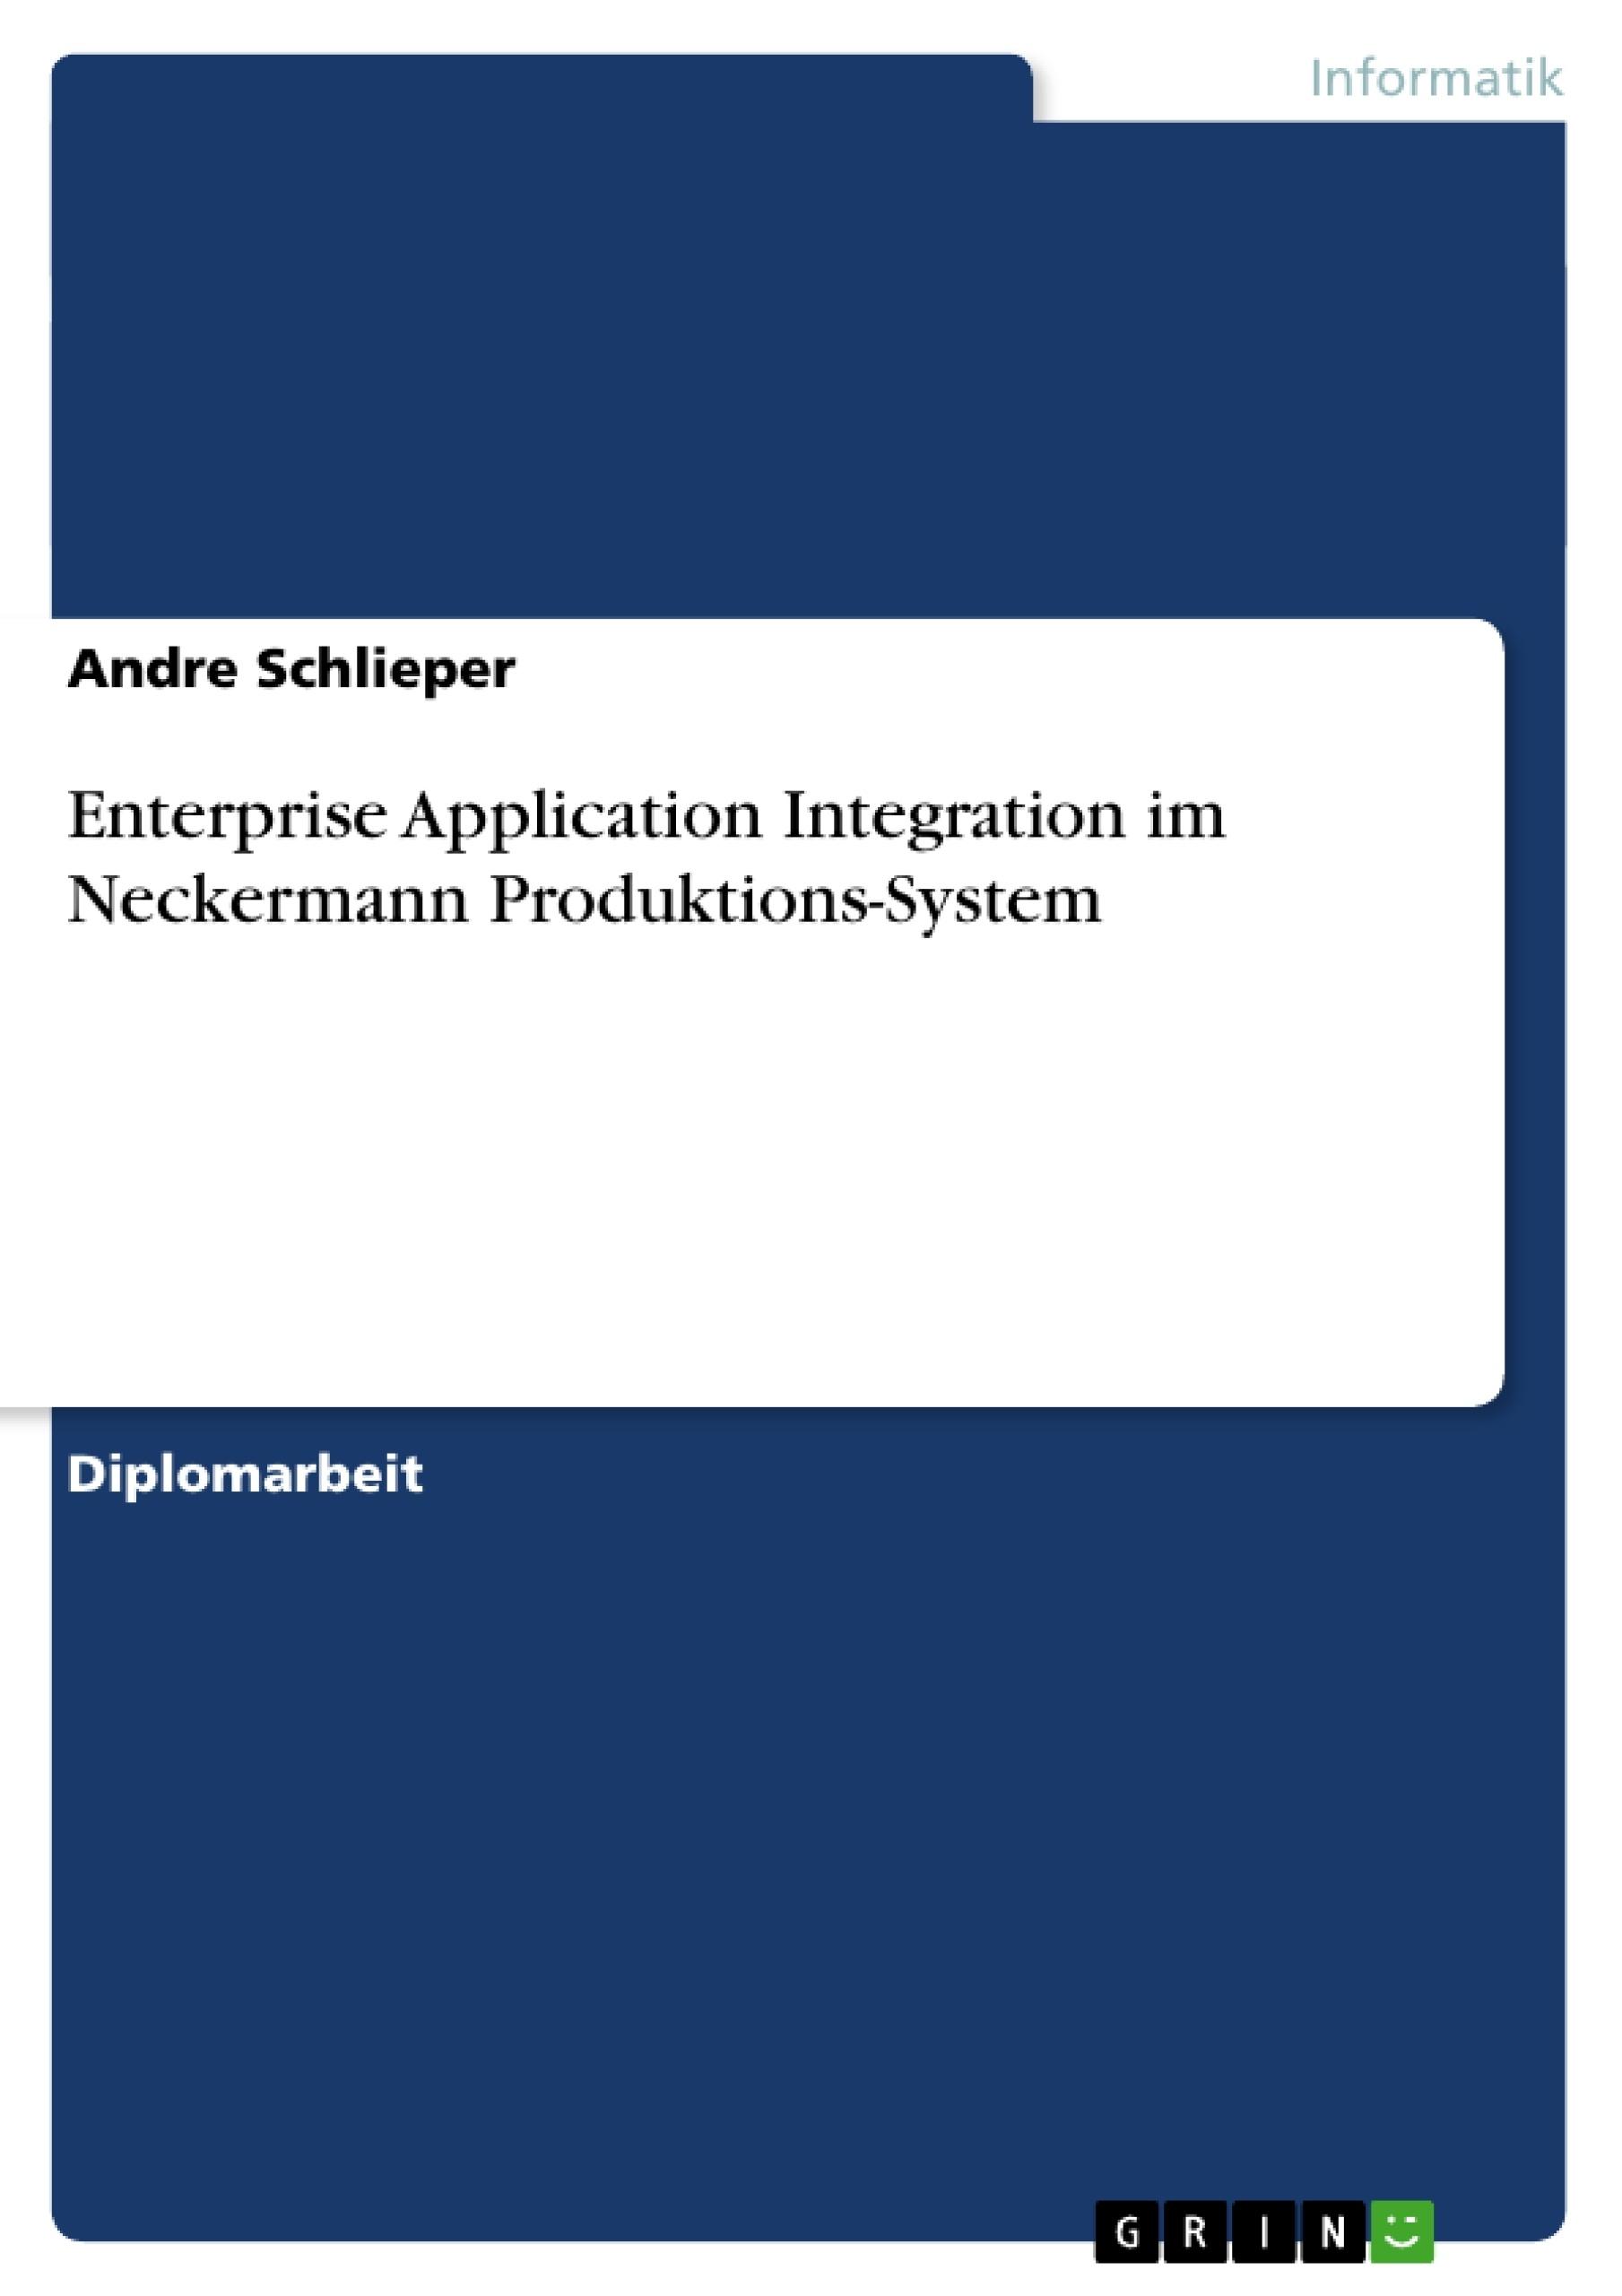 Titel: Enterprise Application Integration im Neckermann Produktions-System